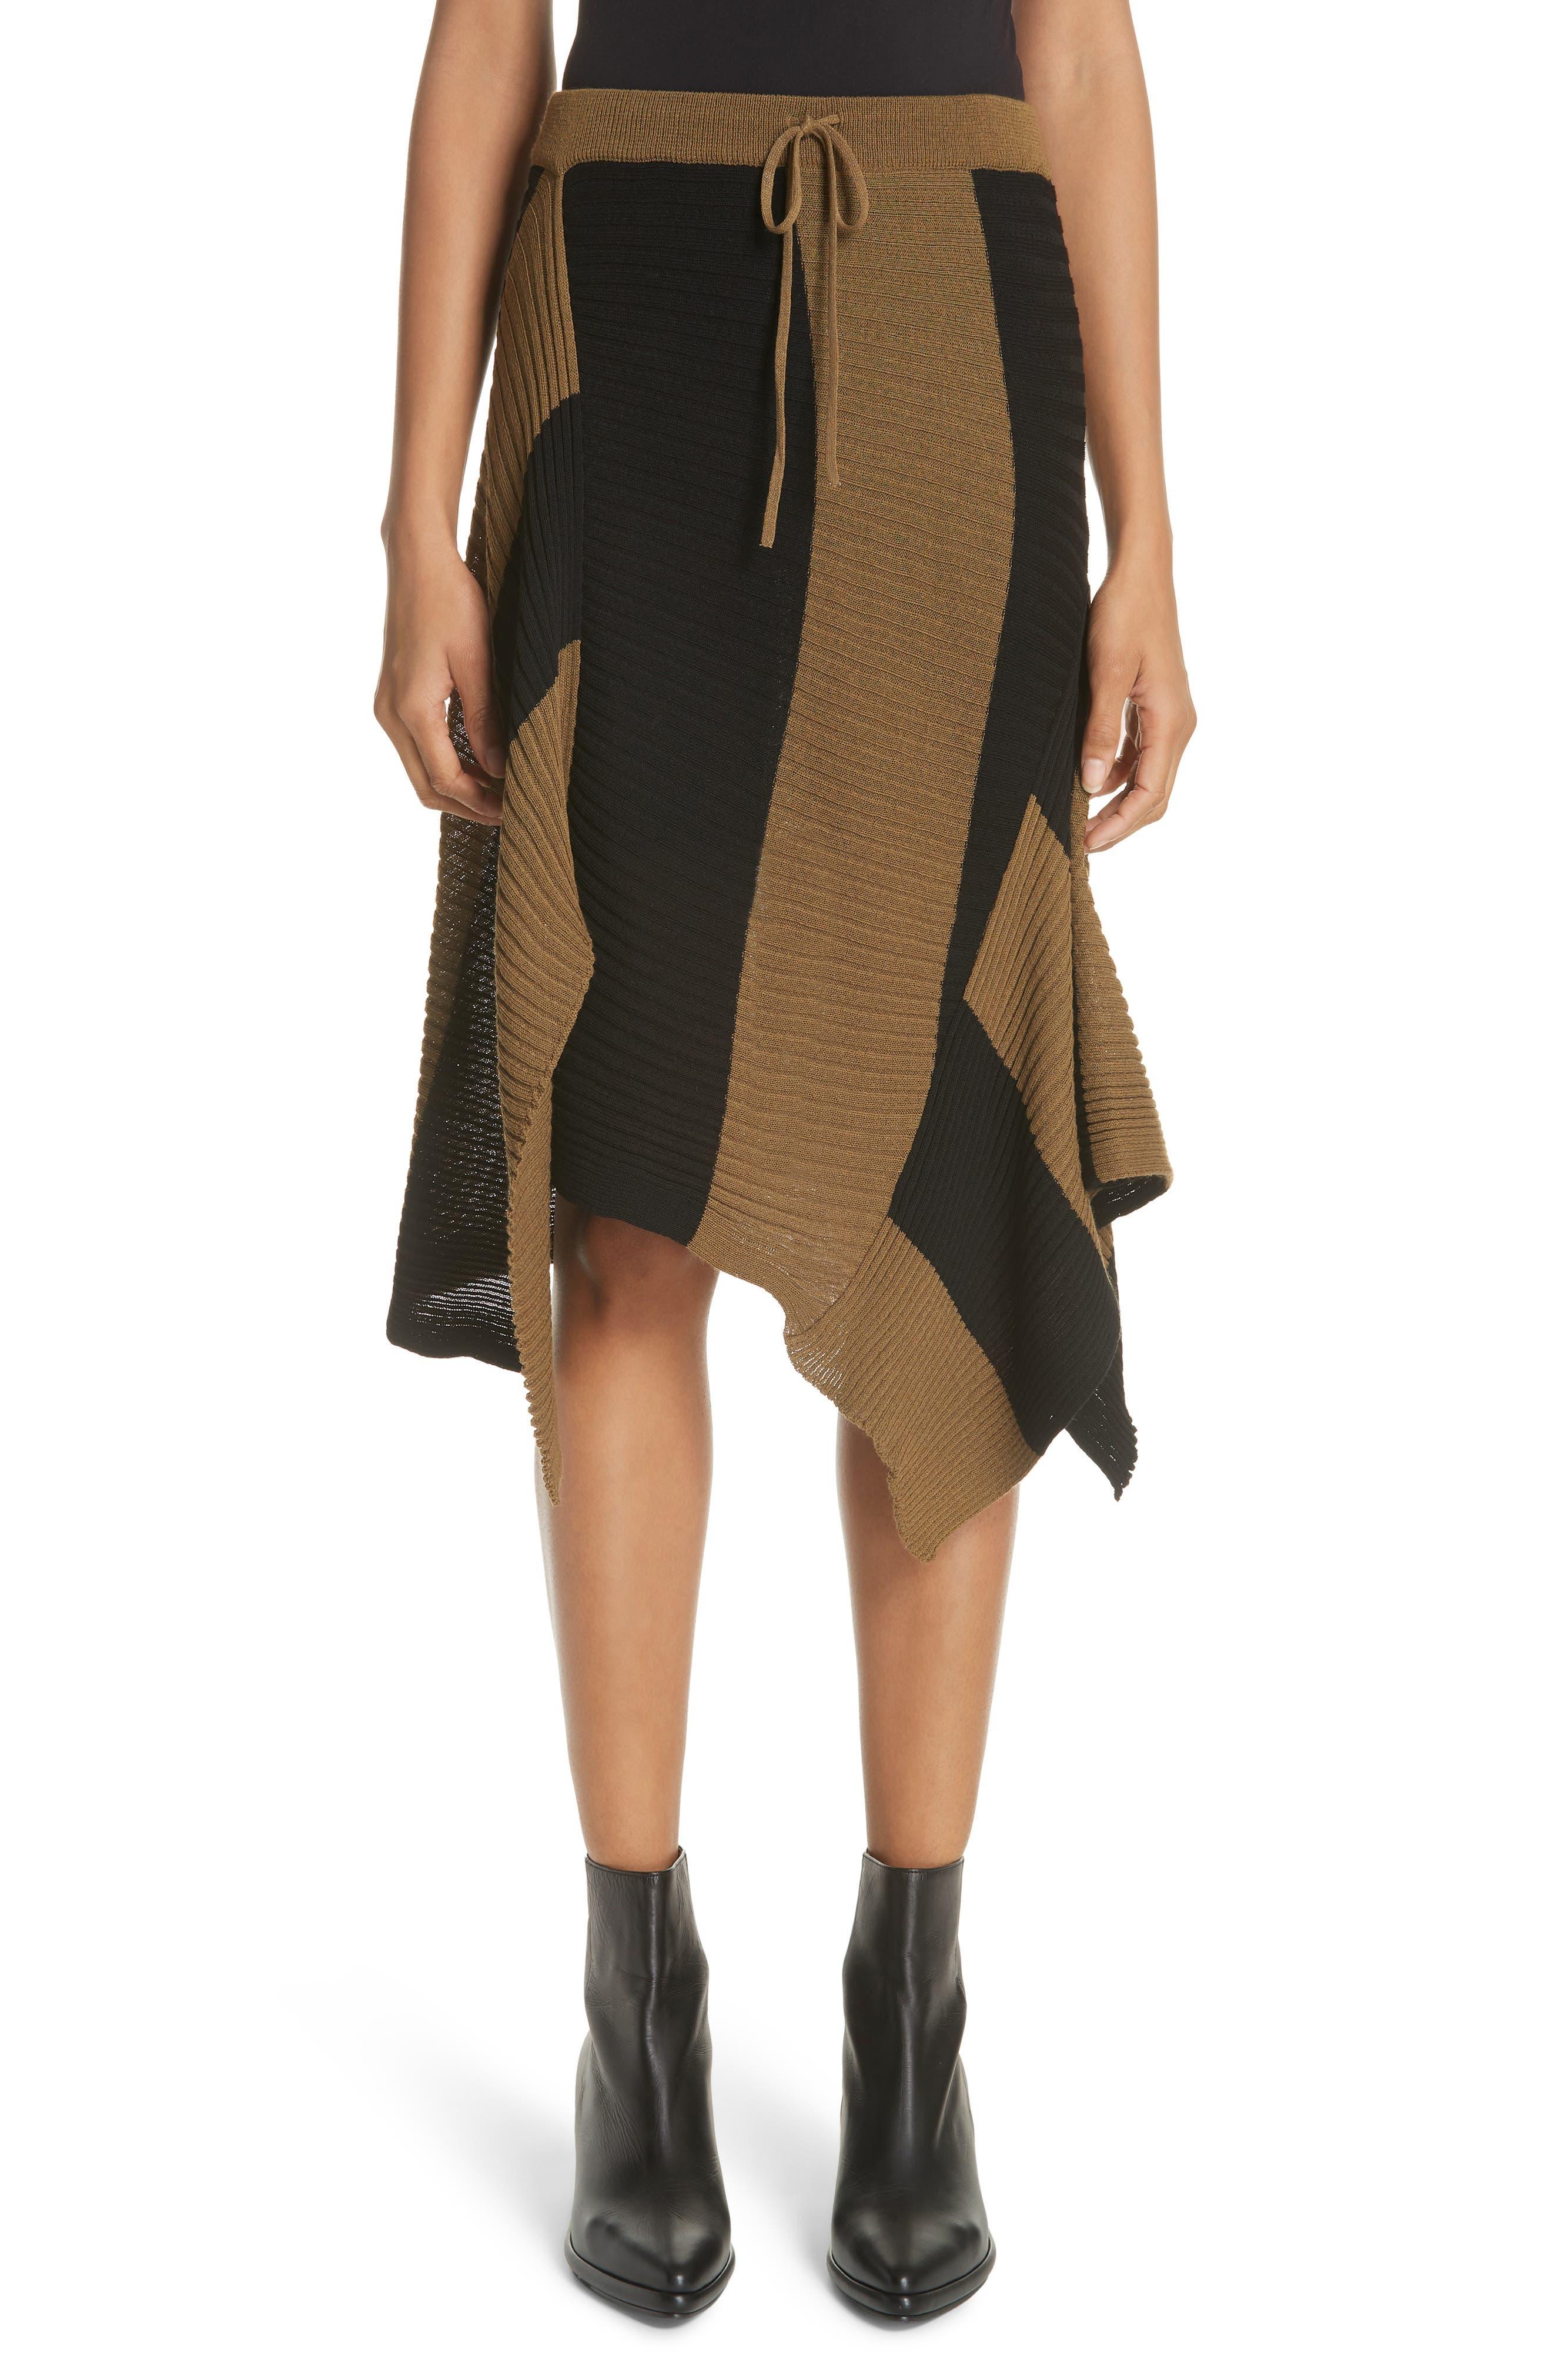 Marques'Almeida Draped Skirt,                             Main thumbnail 1, color,                             Khaki/ Black